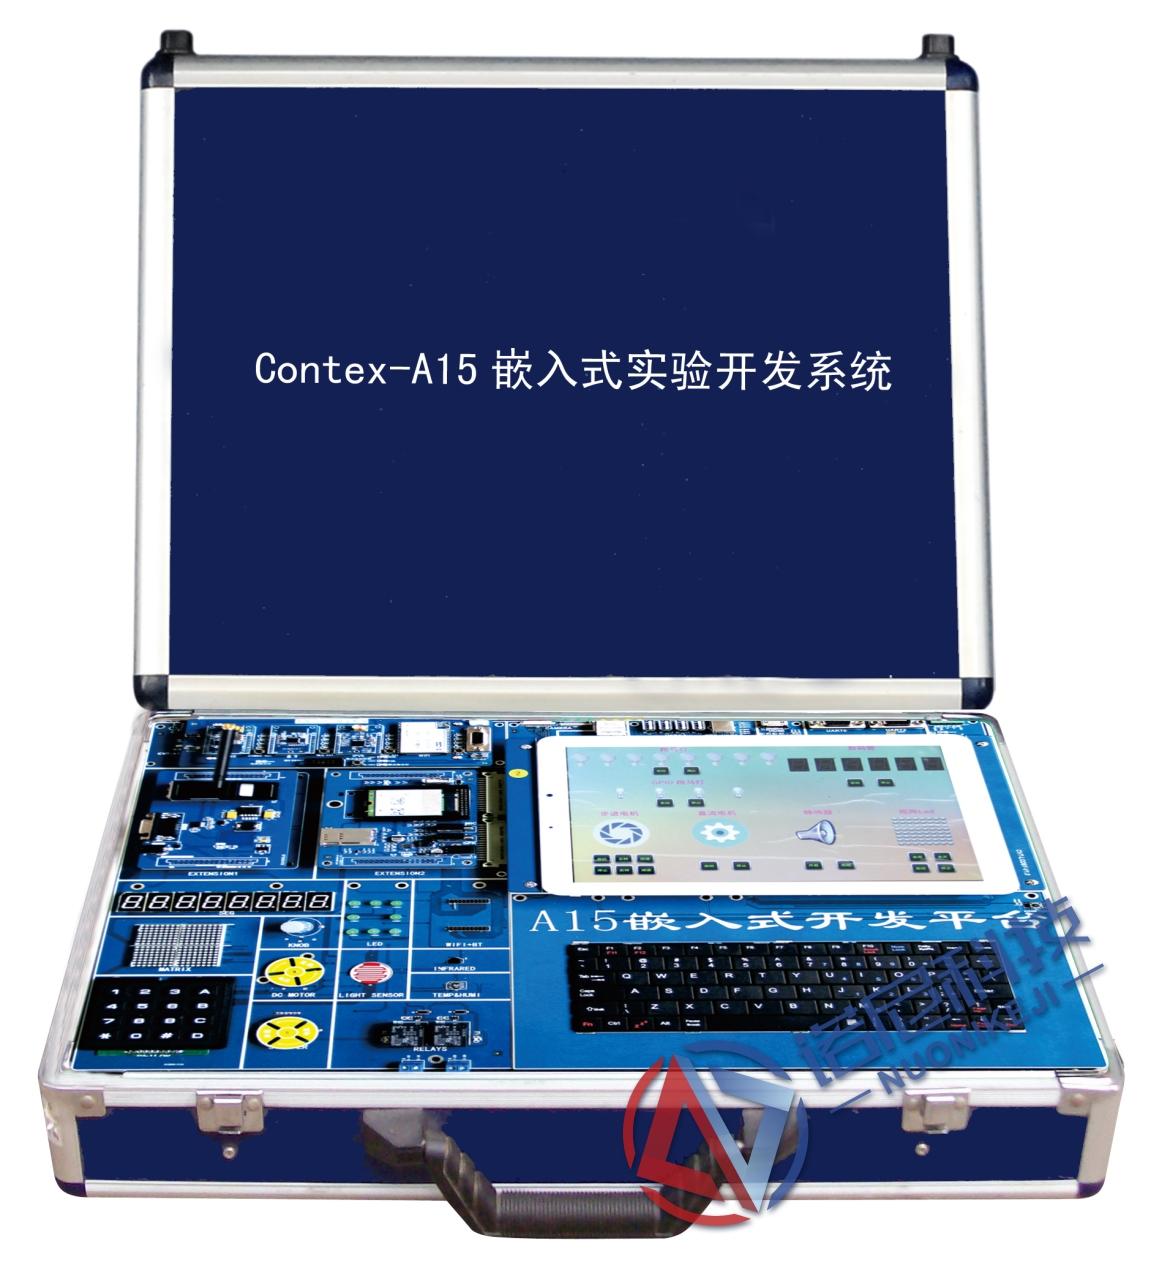 GL0306E2 CORTEX-A15嵌入式实验开发系统